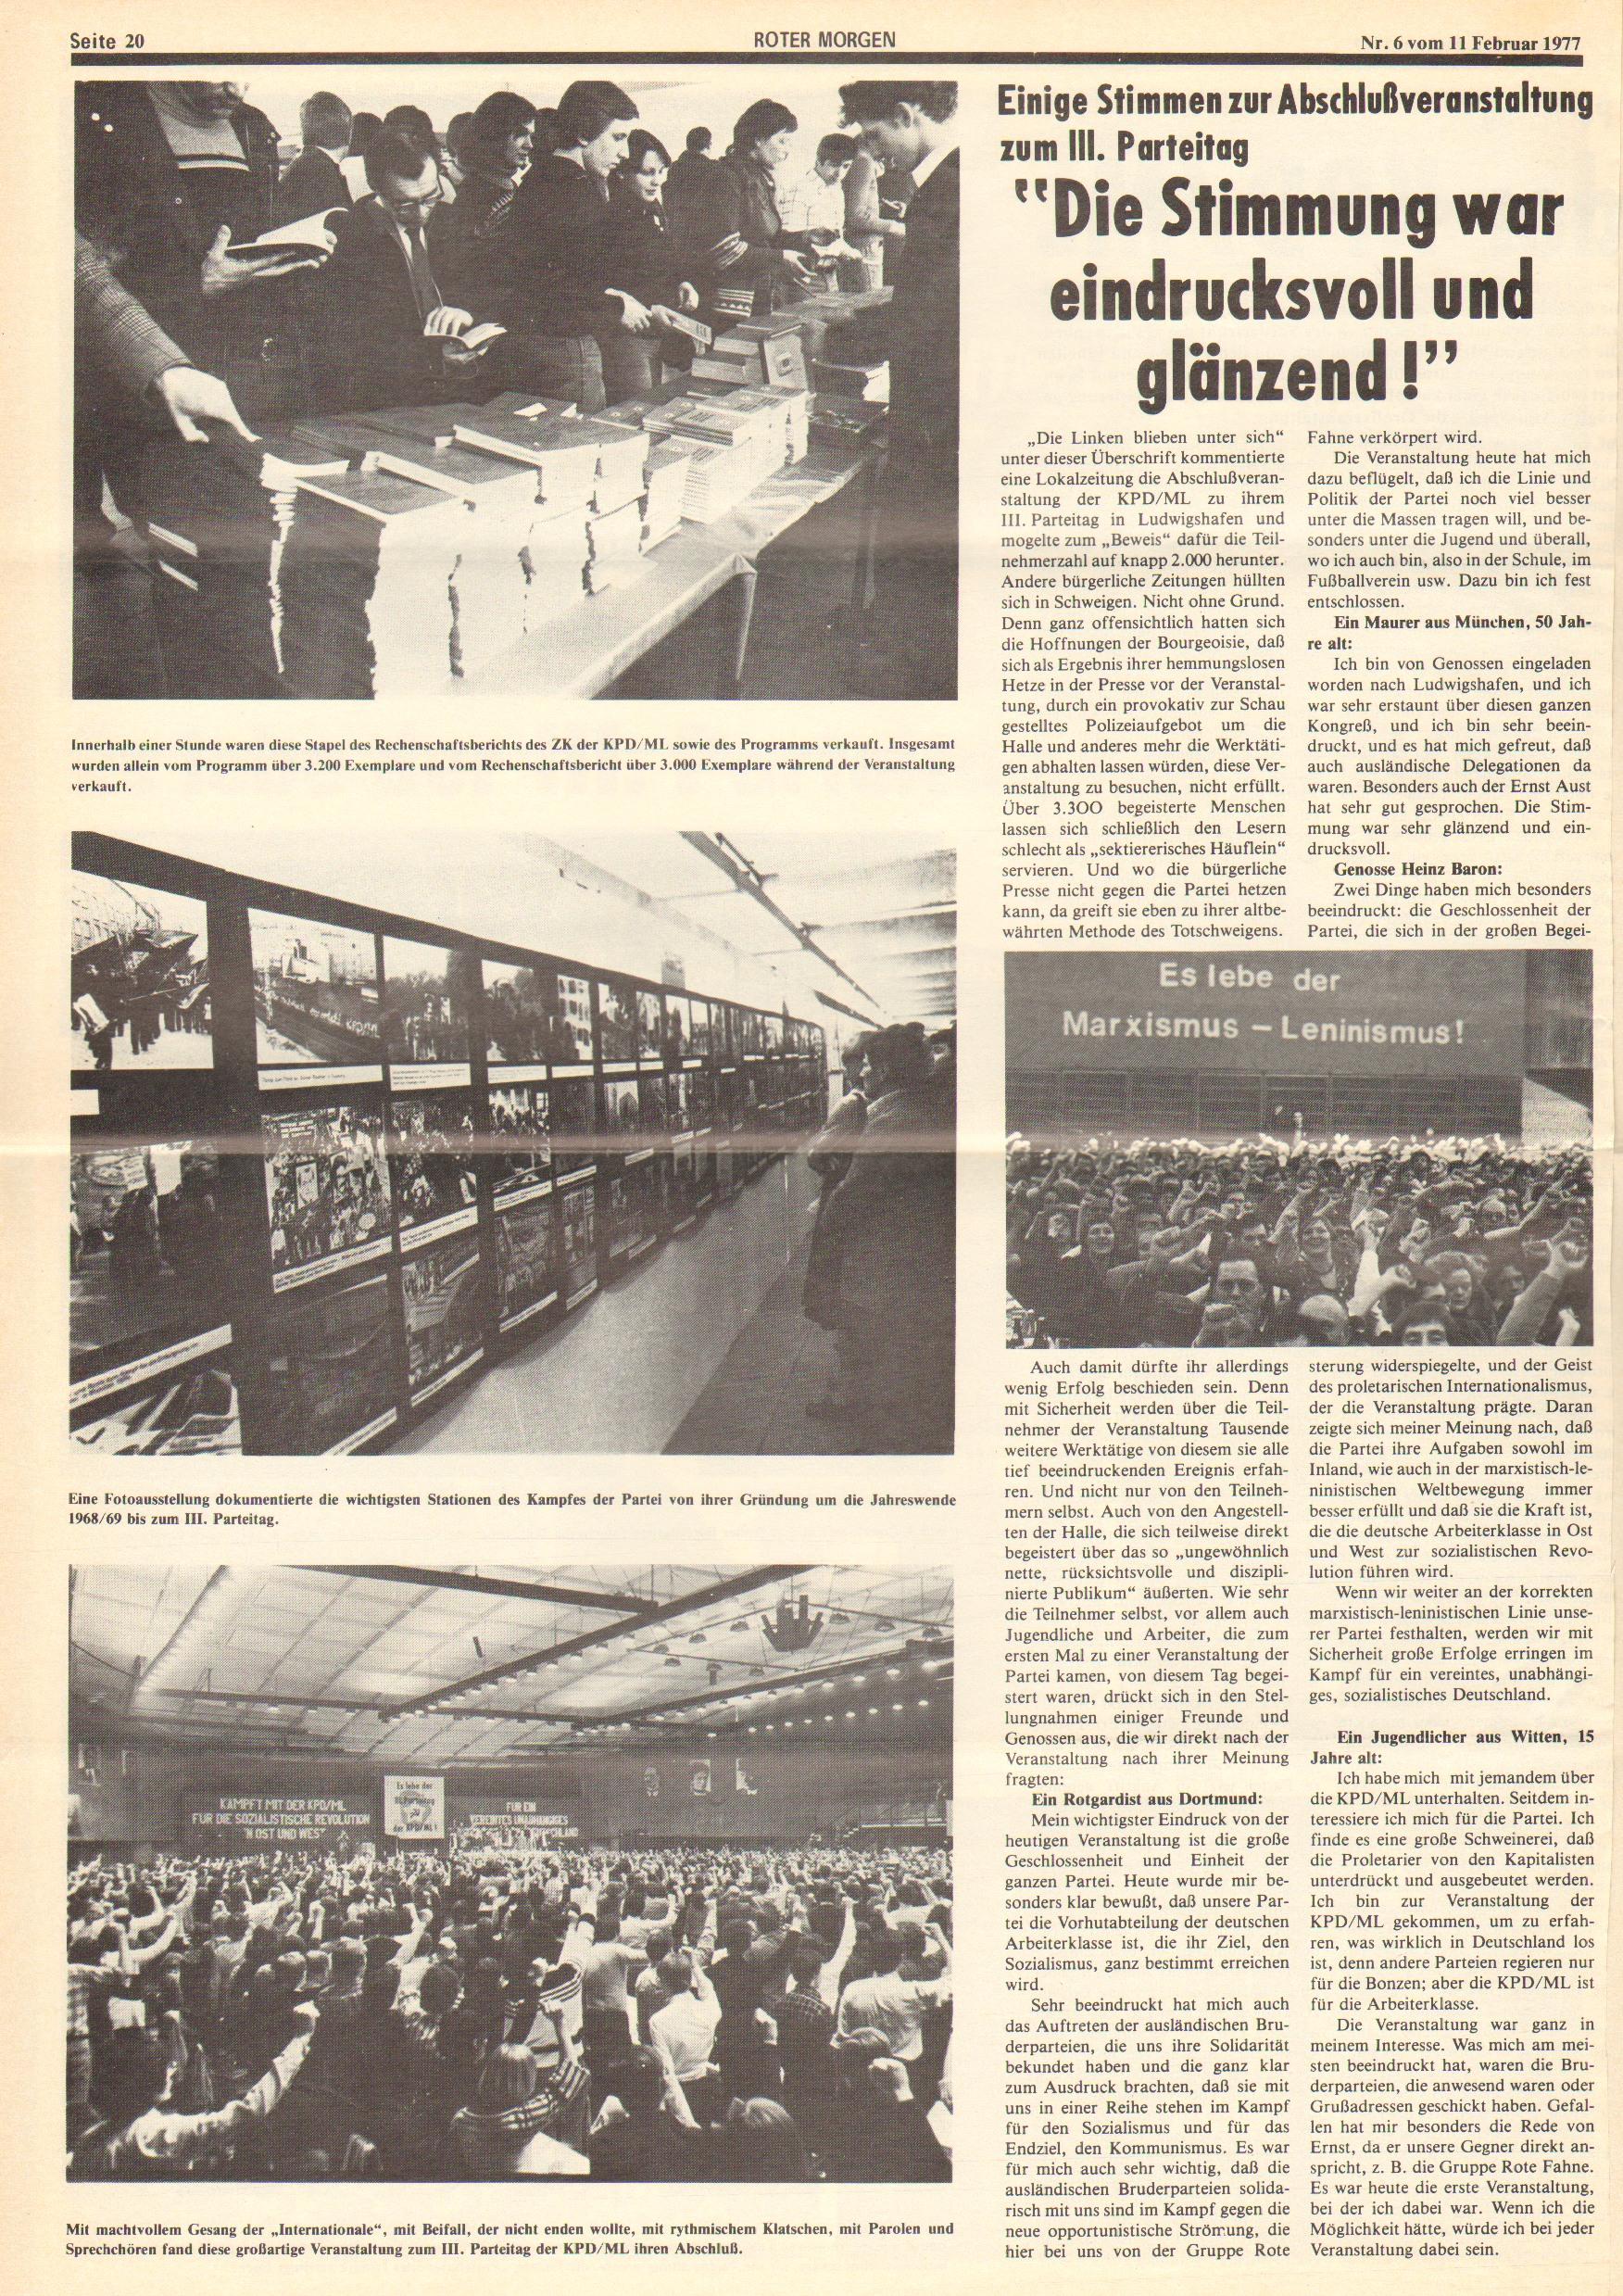 Roter Morgen, 11. Jg., 11. Februar 1977, Nr. 6, Seite 20